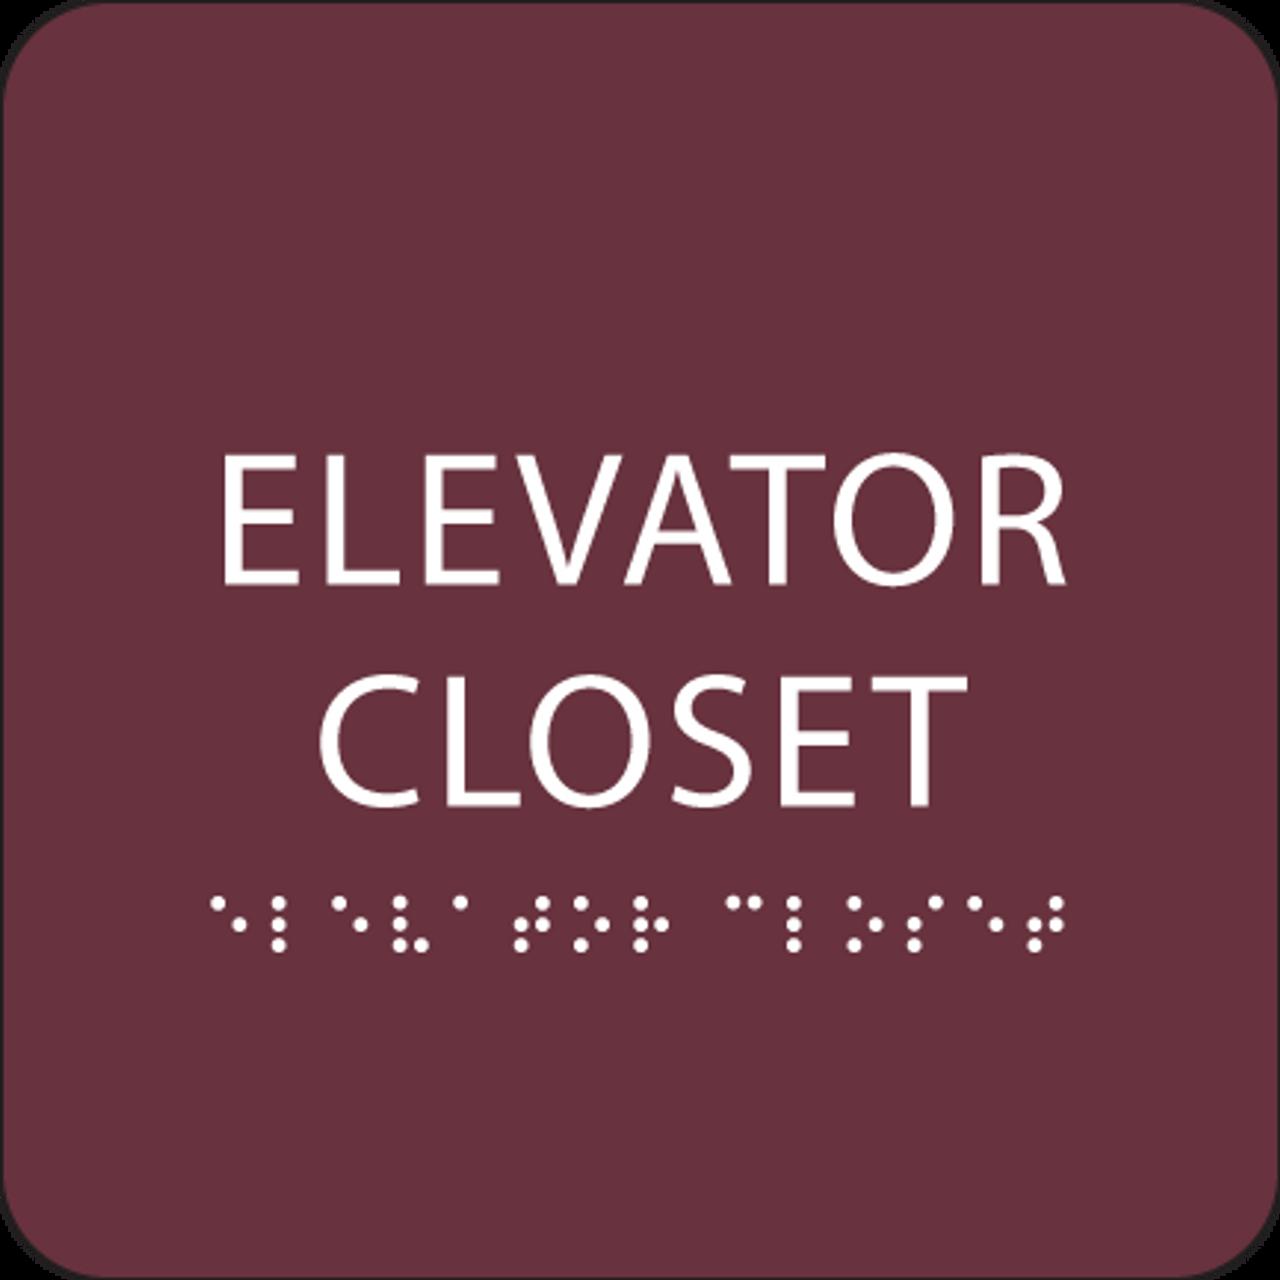 Burgundy ADA Elevator Closet Sign